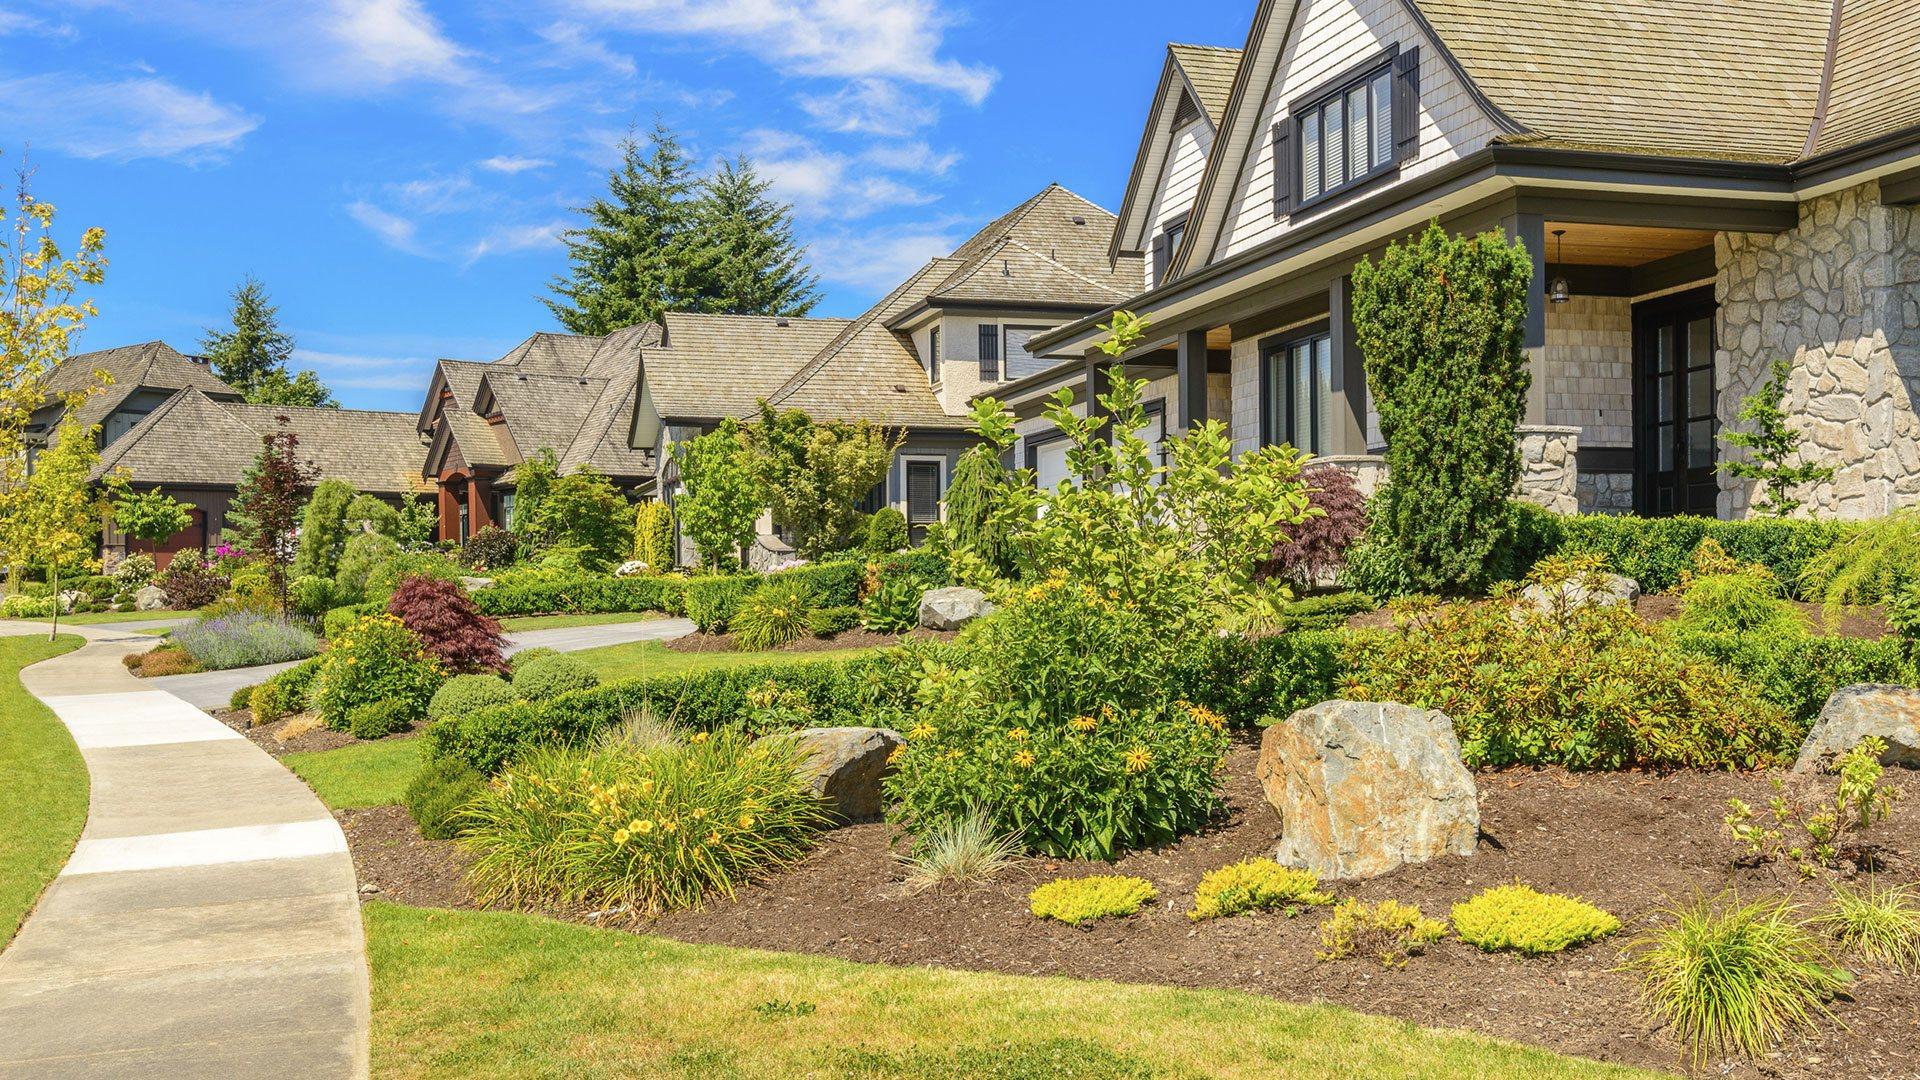 Greenscapes Lawn Services & Landscape Design Lawn Maintenance, Landscaping and Lawn Care slide 2